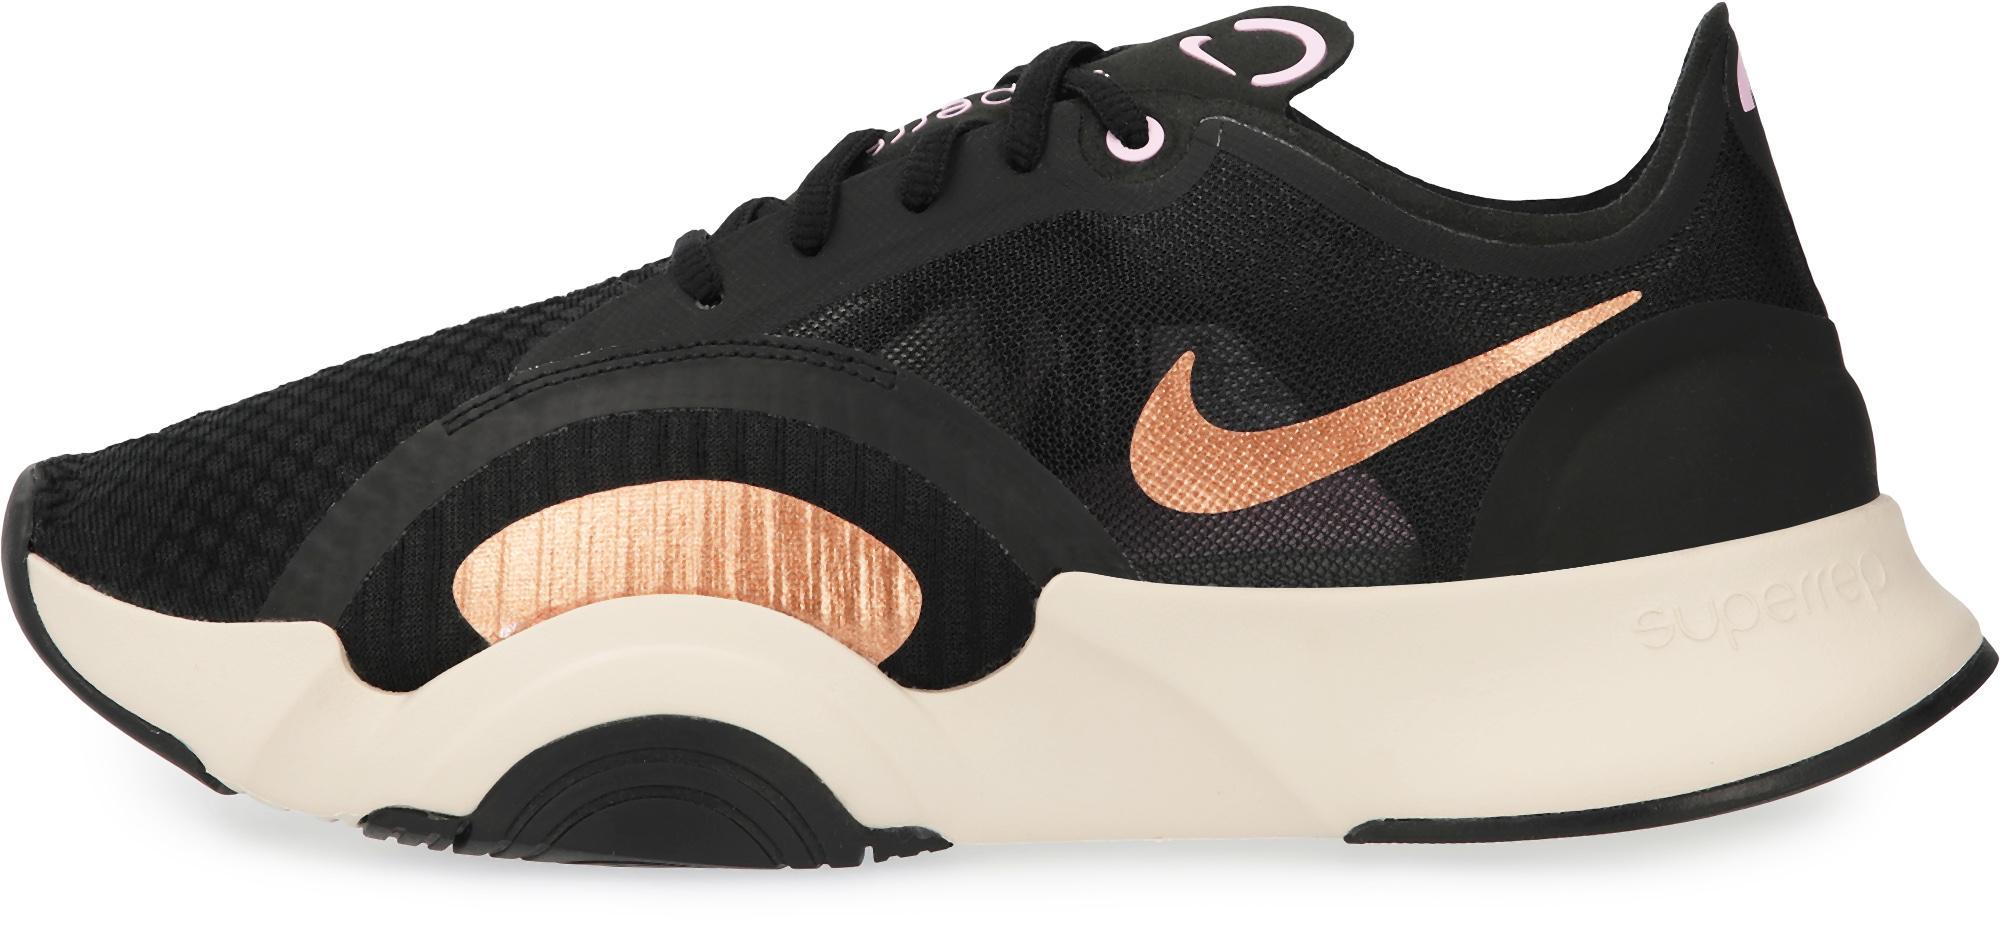 Nike Кроссовки женские Nike WMNS Superrep Go, размер 39.5